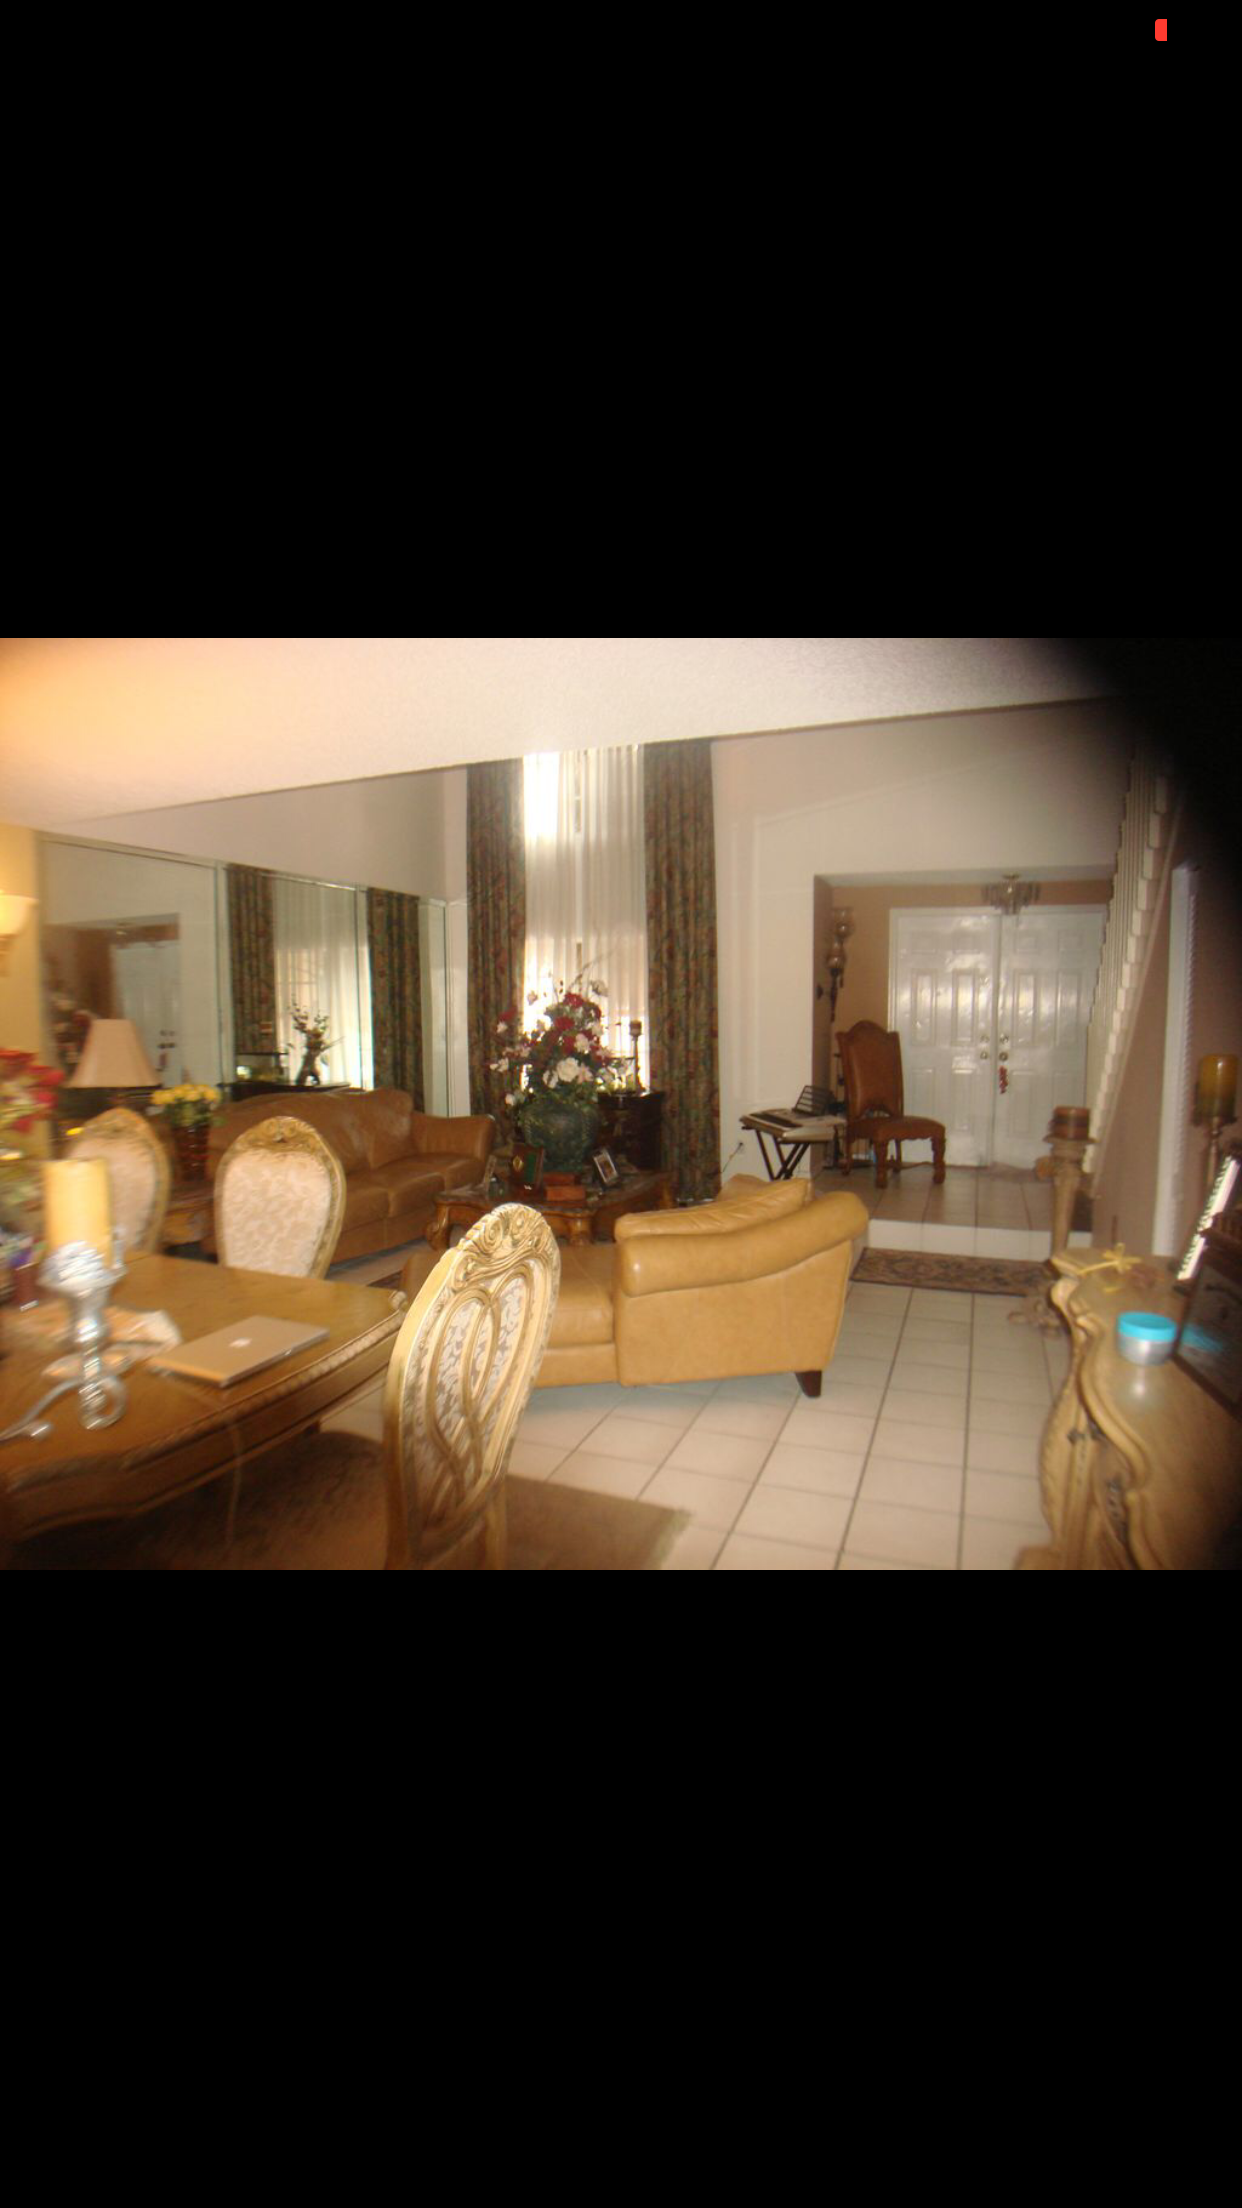 8288 Nw 195th Ter, Hialeah, FL 33015 | RealEstate.com